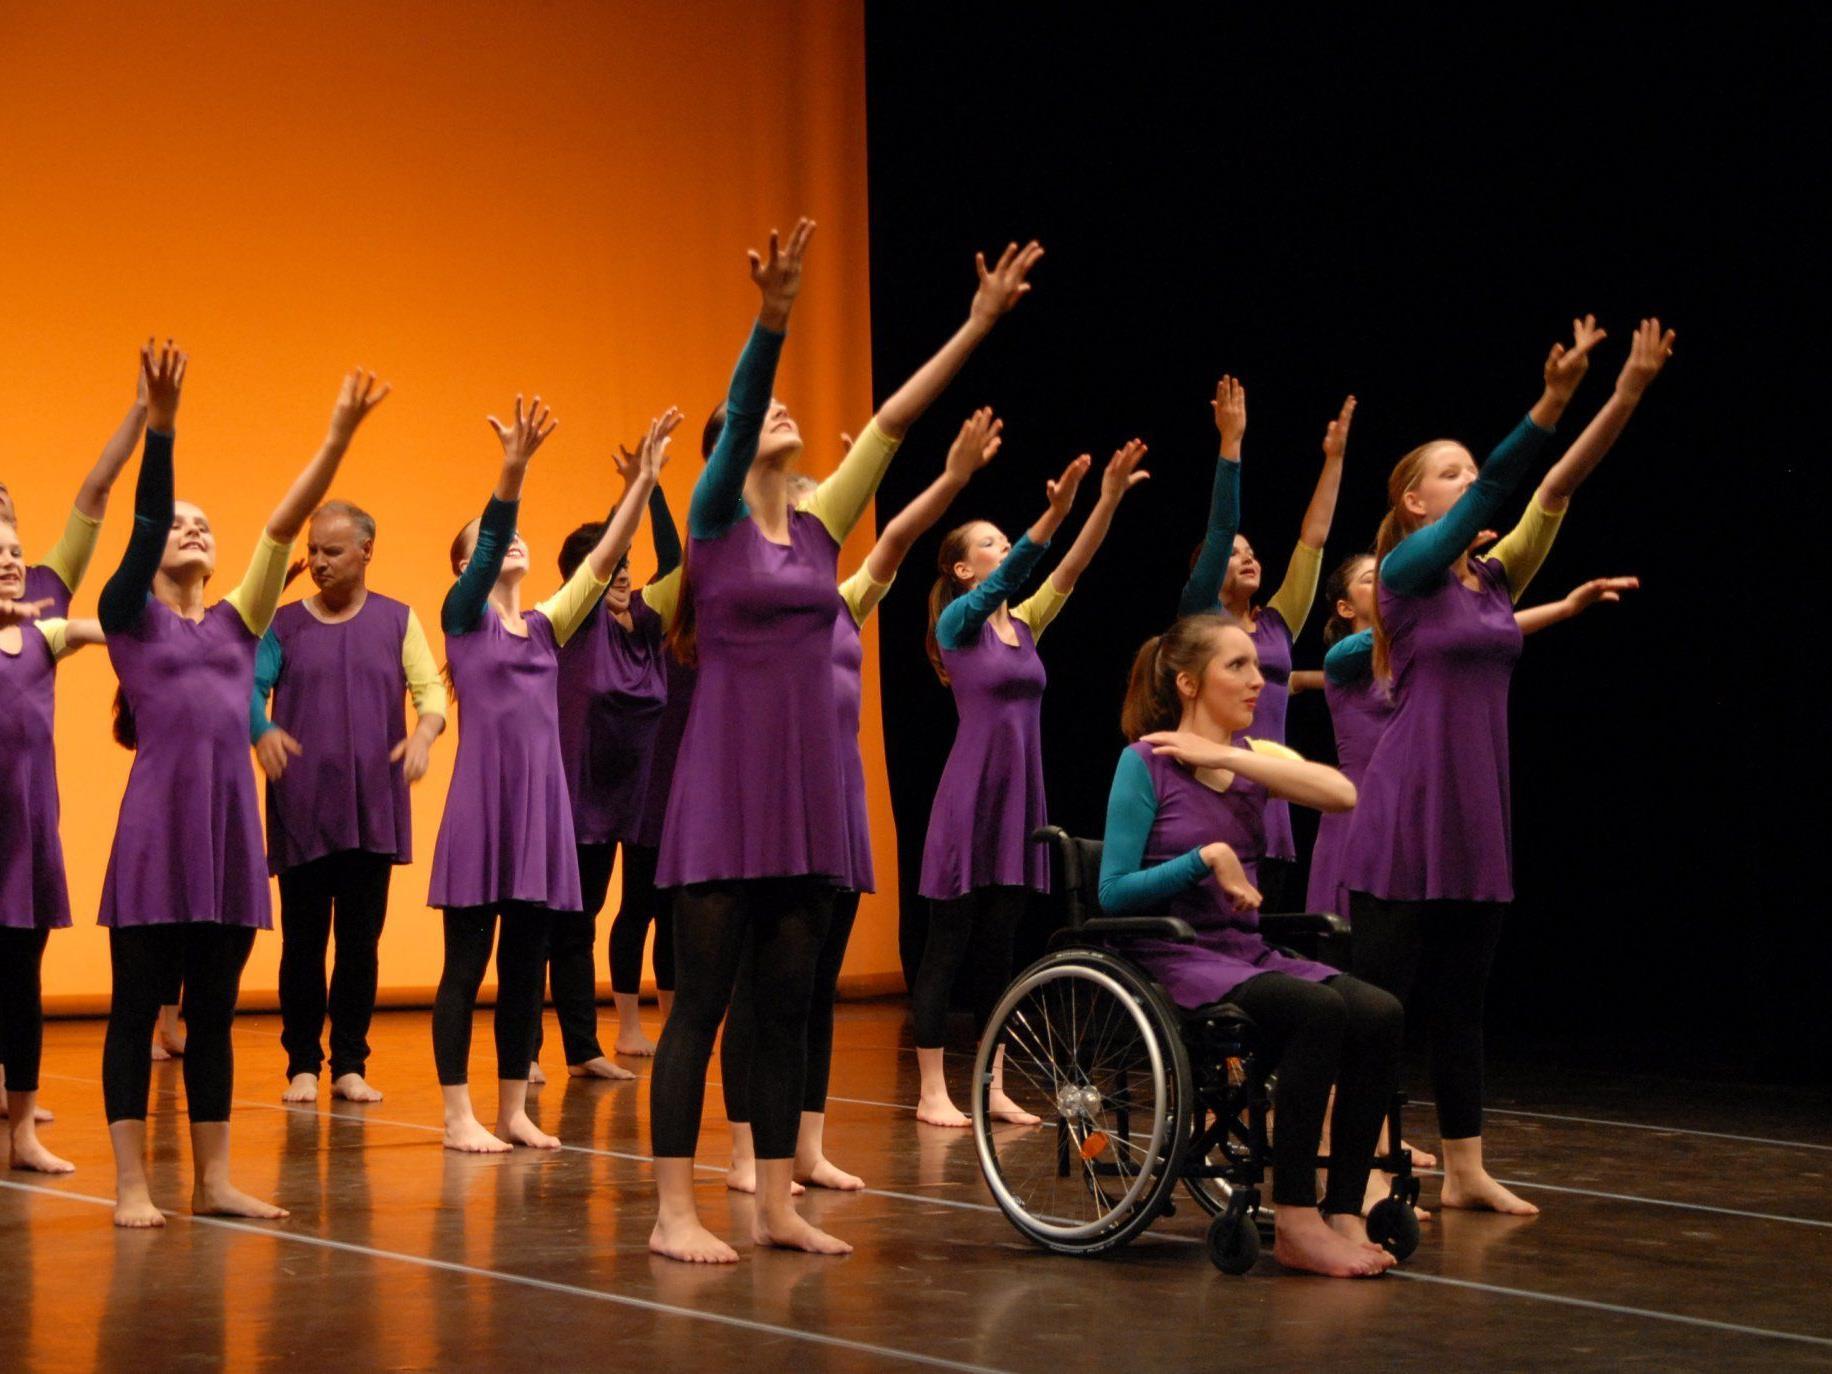 Daniela Schwald, Tanzperofrmance Power of Dance 2011